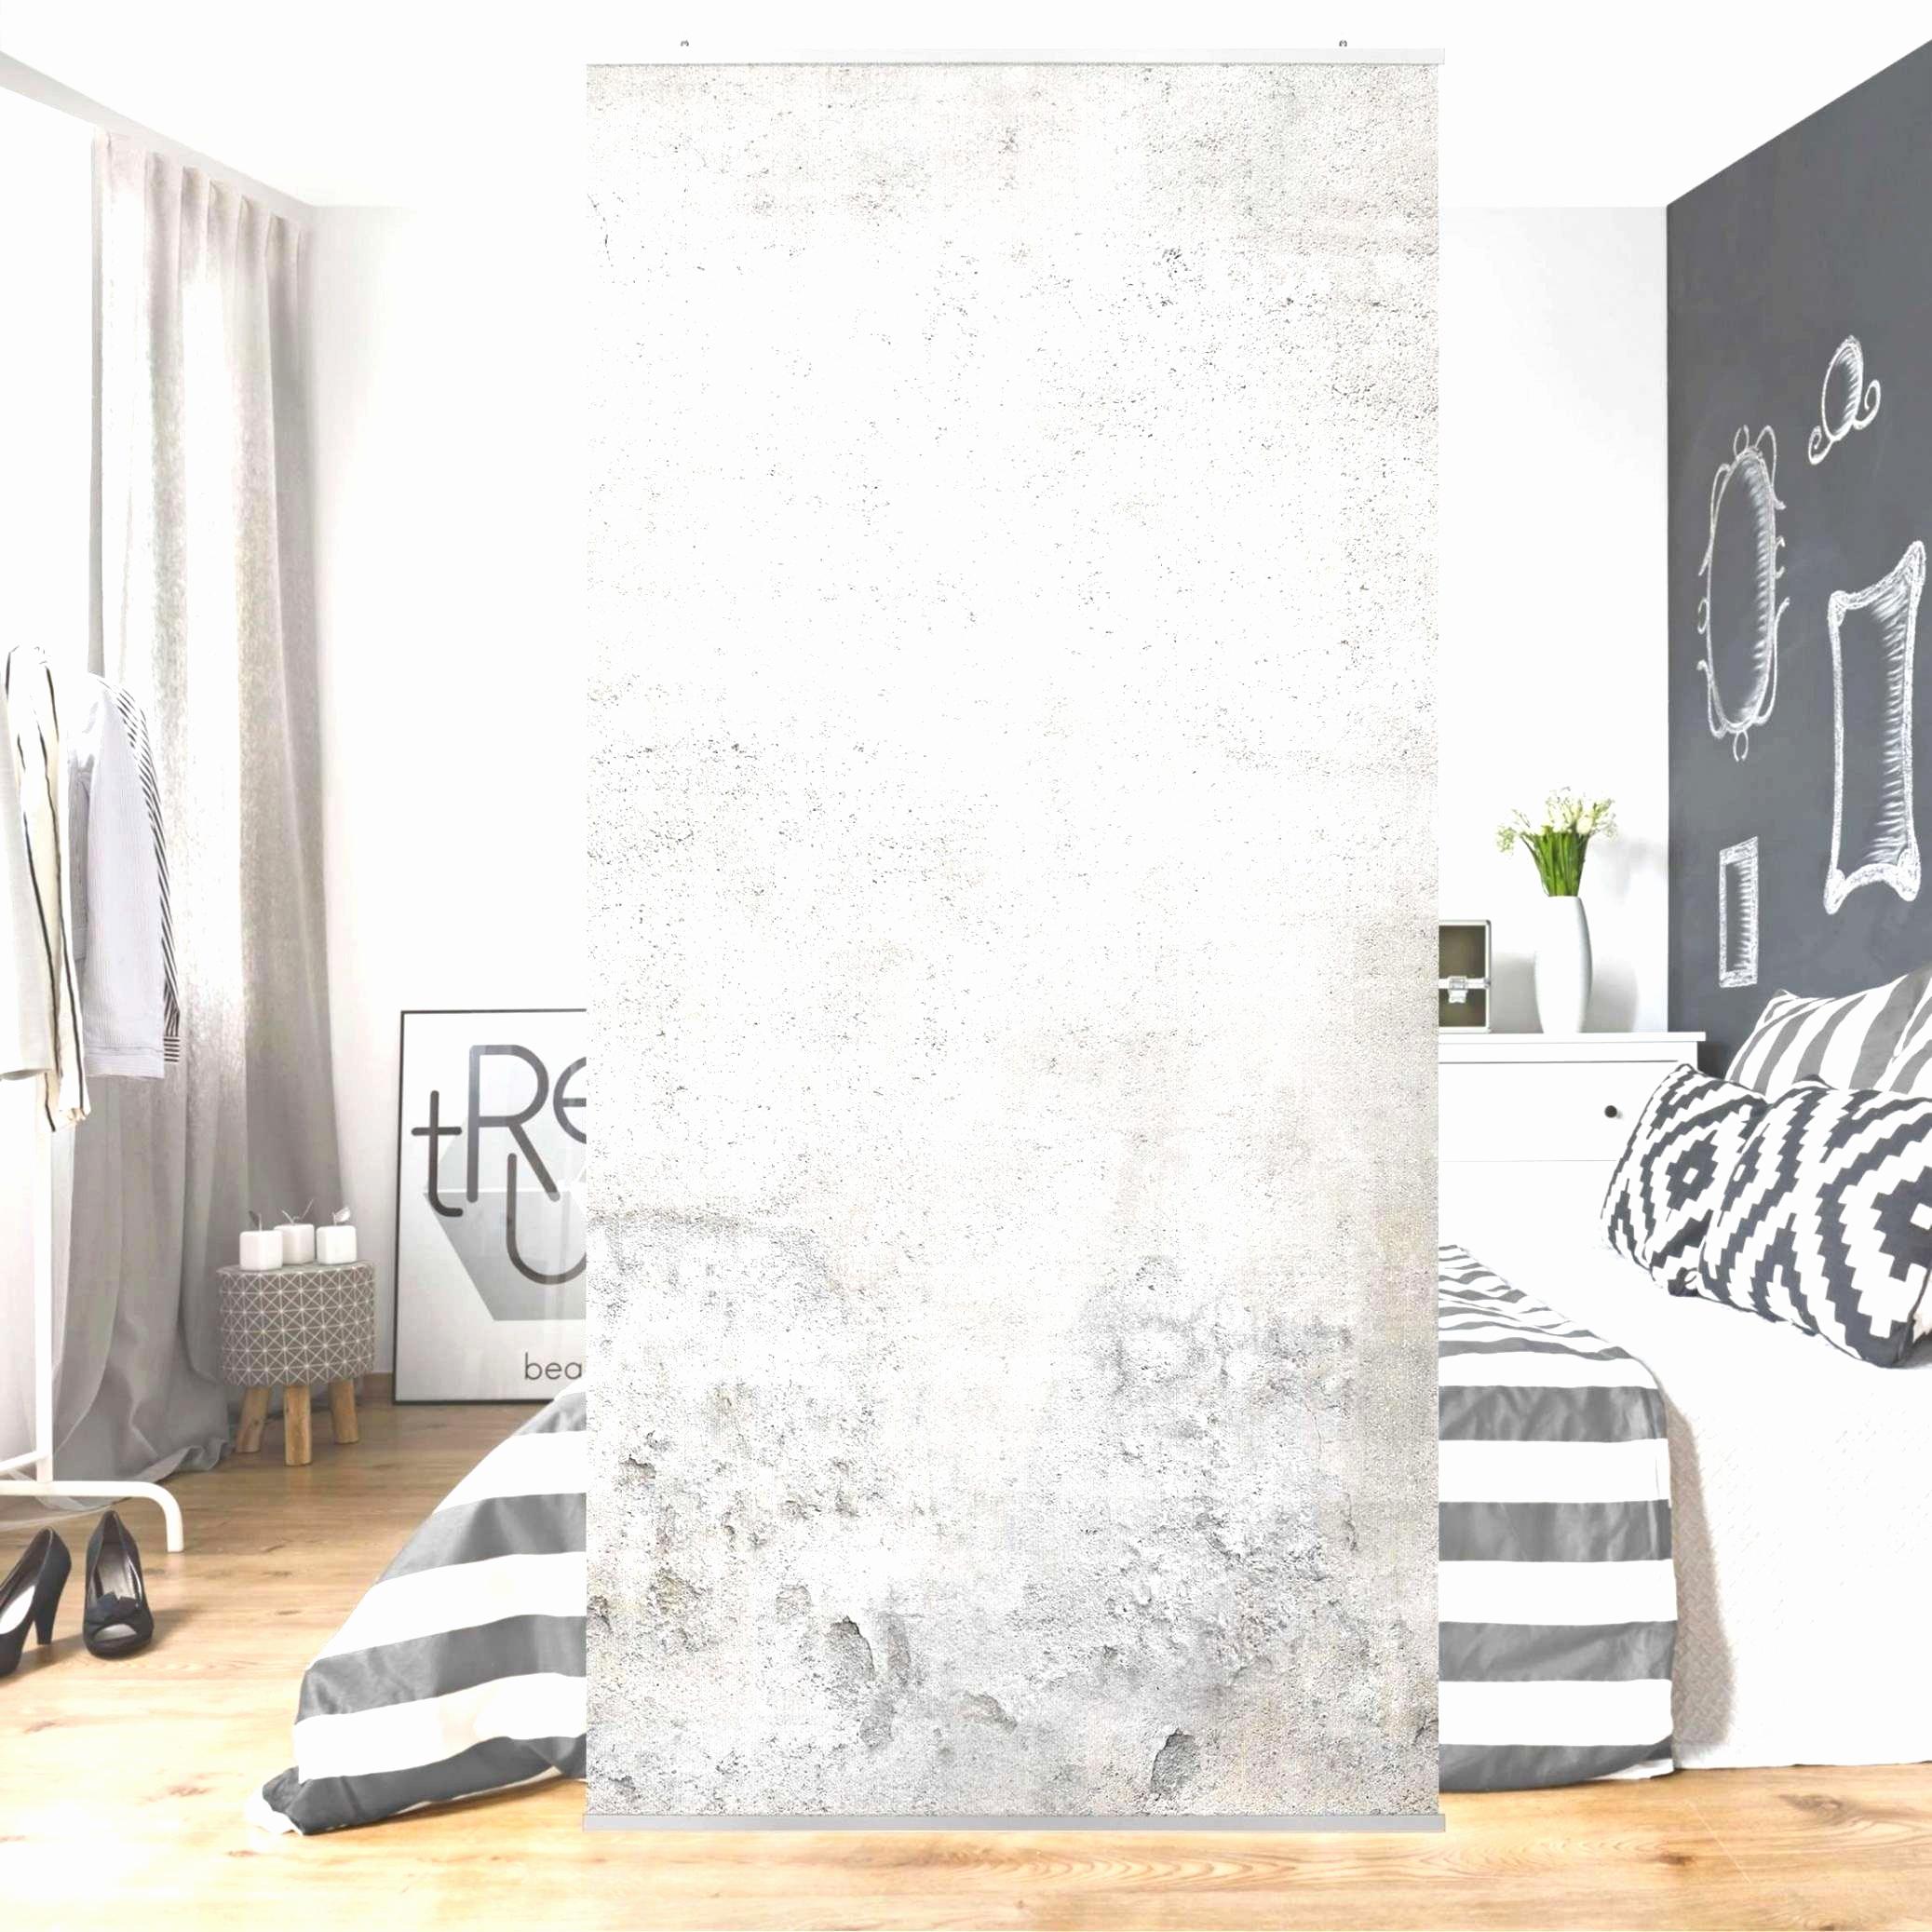 Tapeten Wohnzimmer Ideen 2016 Inspiration Tapeten F R